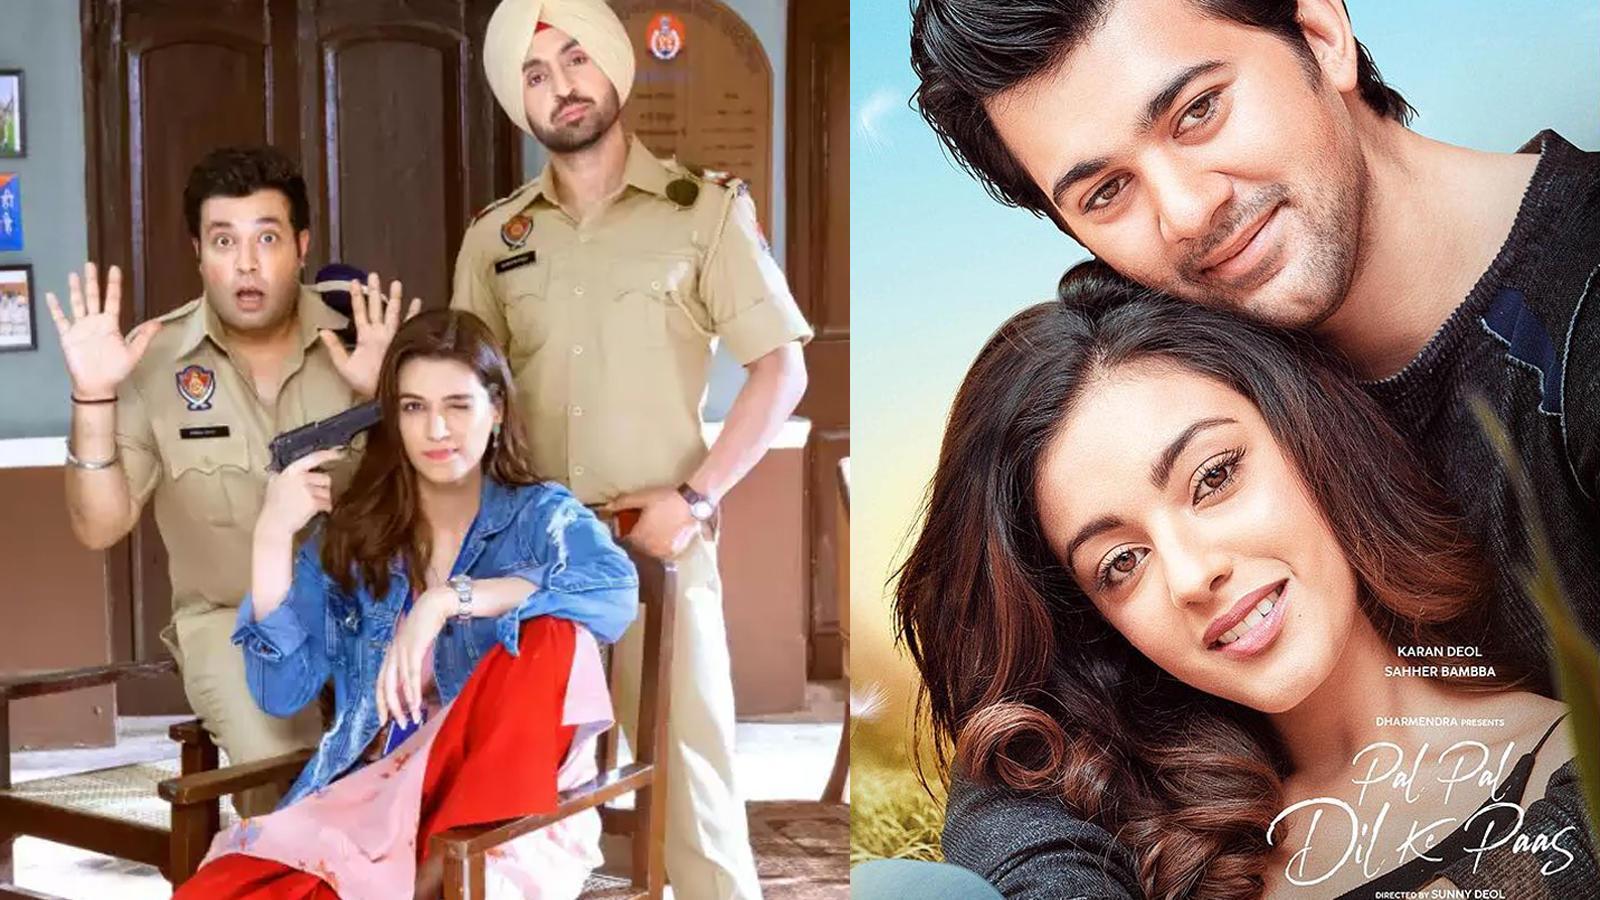 Diljit Dosanjh-Kriti Sanon starrer 'Arjun Patiala' to clash with Karan Deol's 'Pal Pal Dil Ke Paas'